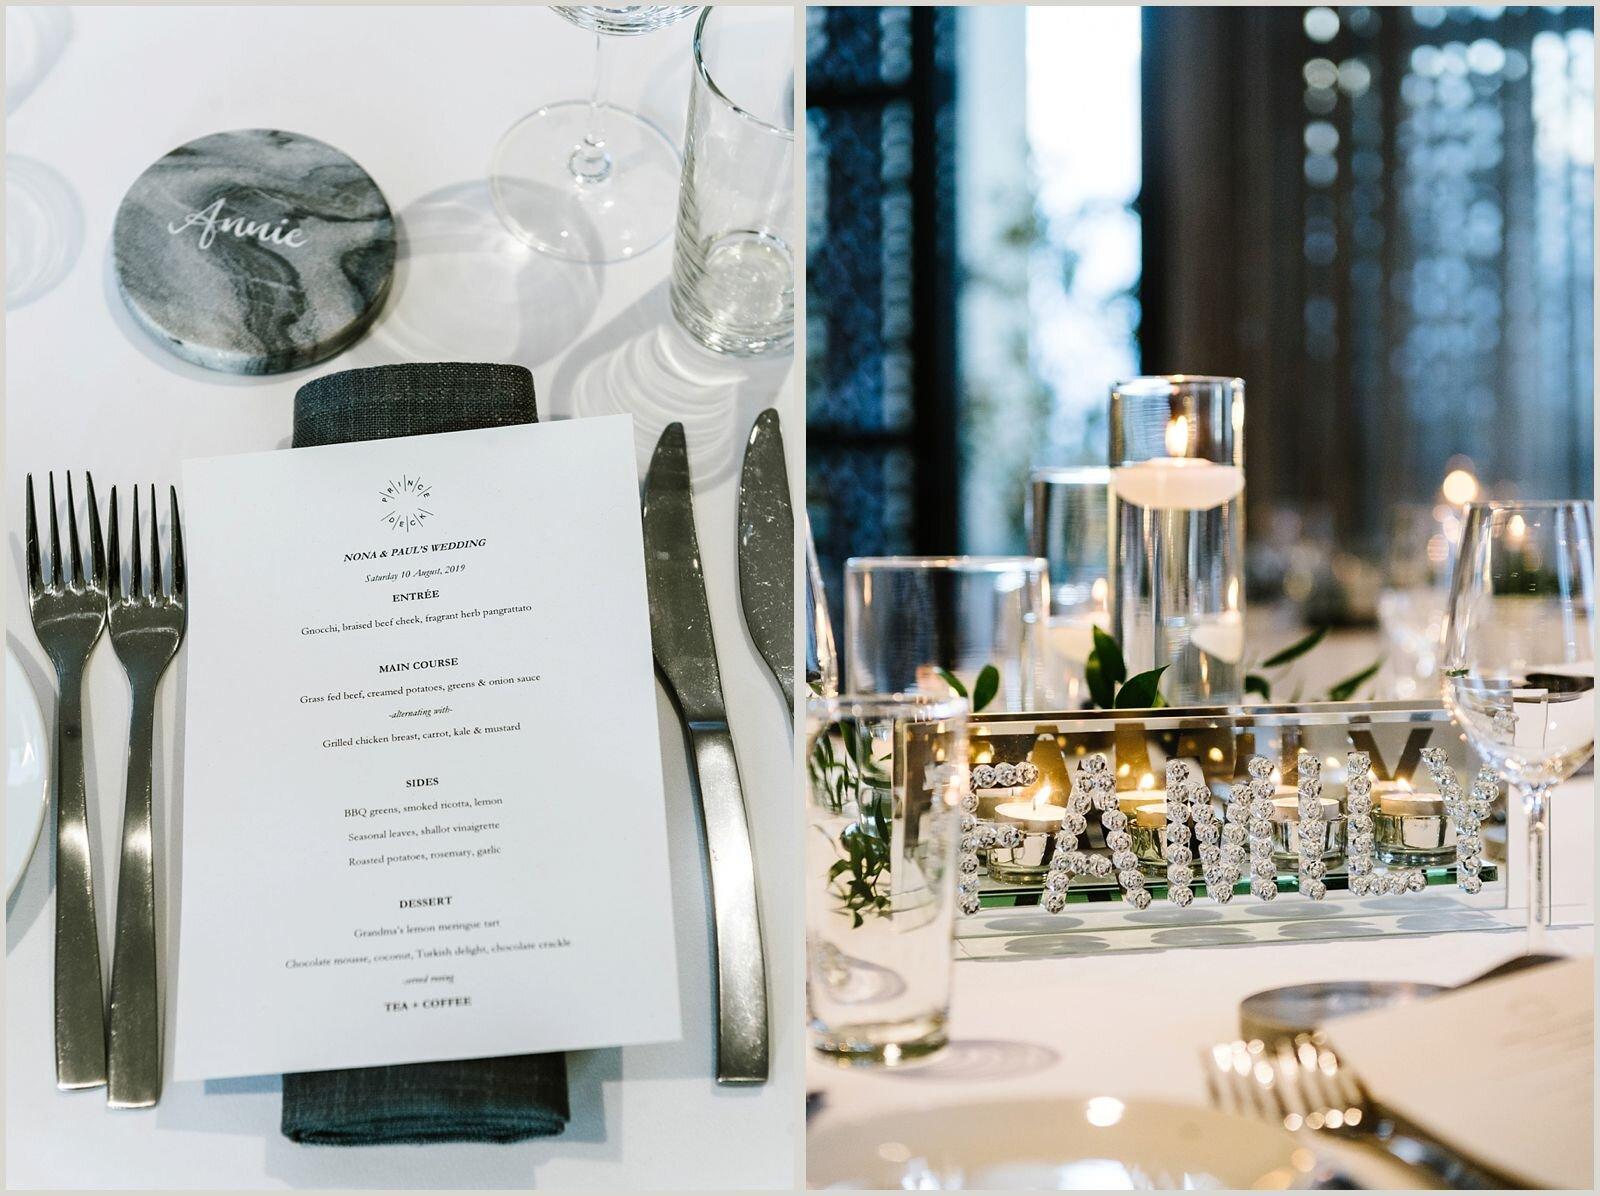 joseph_koprek_wedding_melbourne_the_prince_deck_0072.jpg